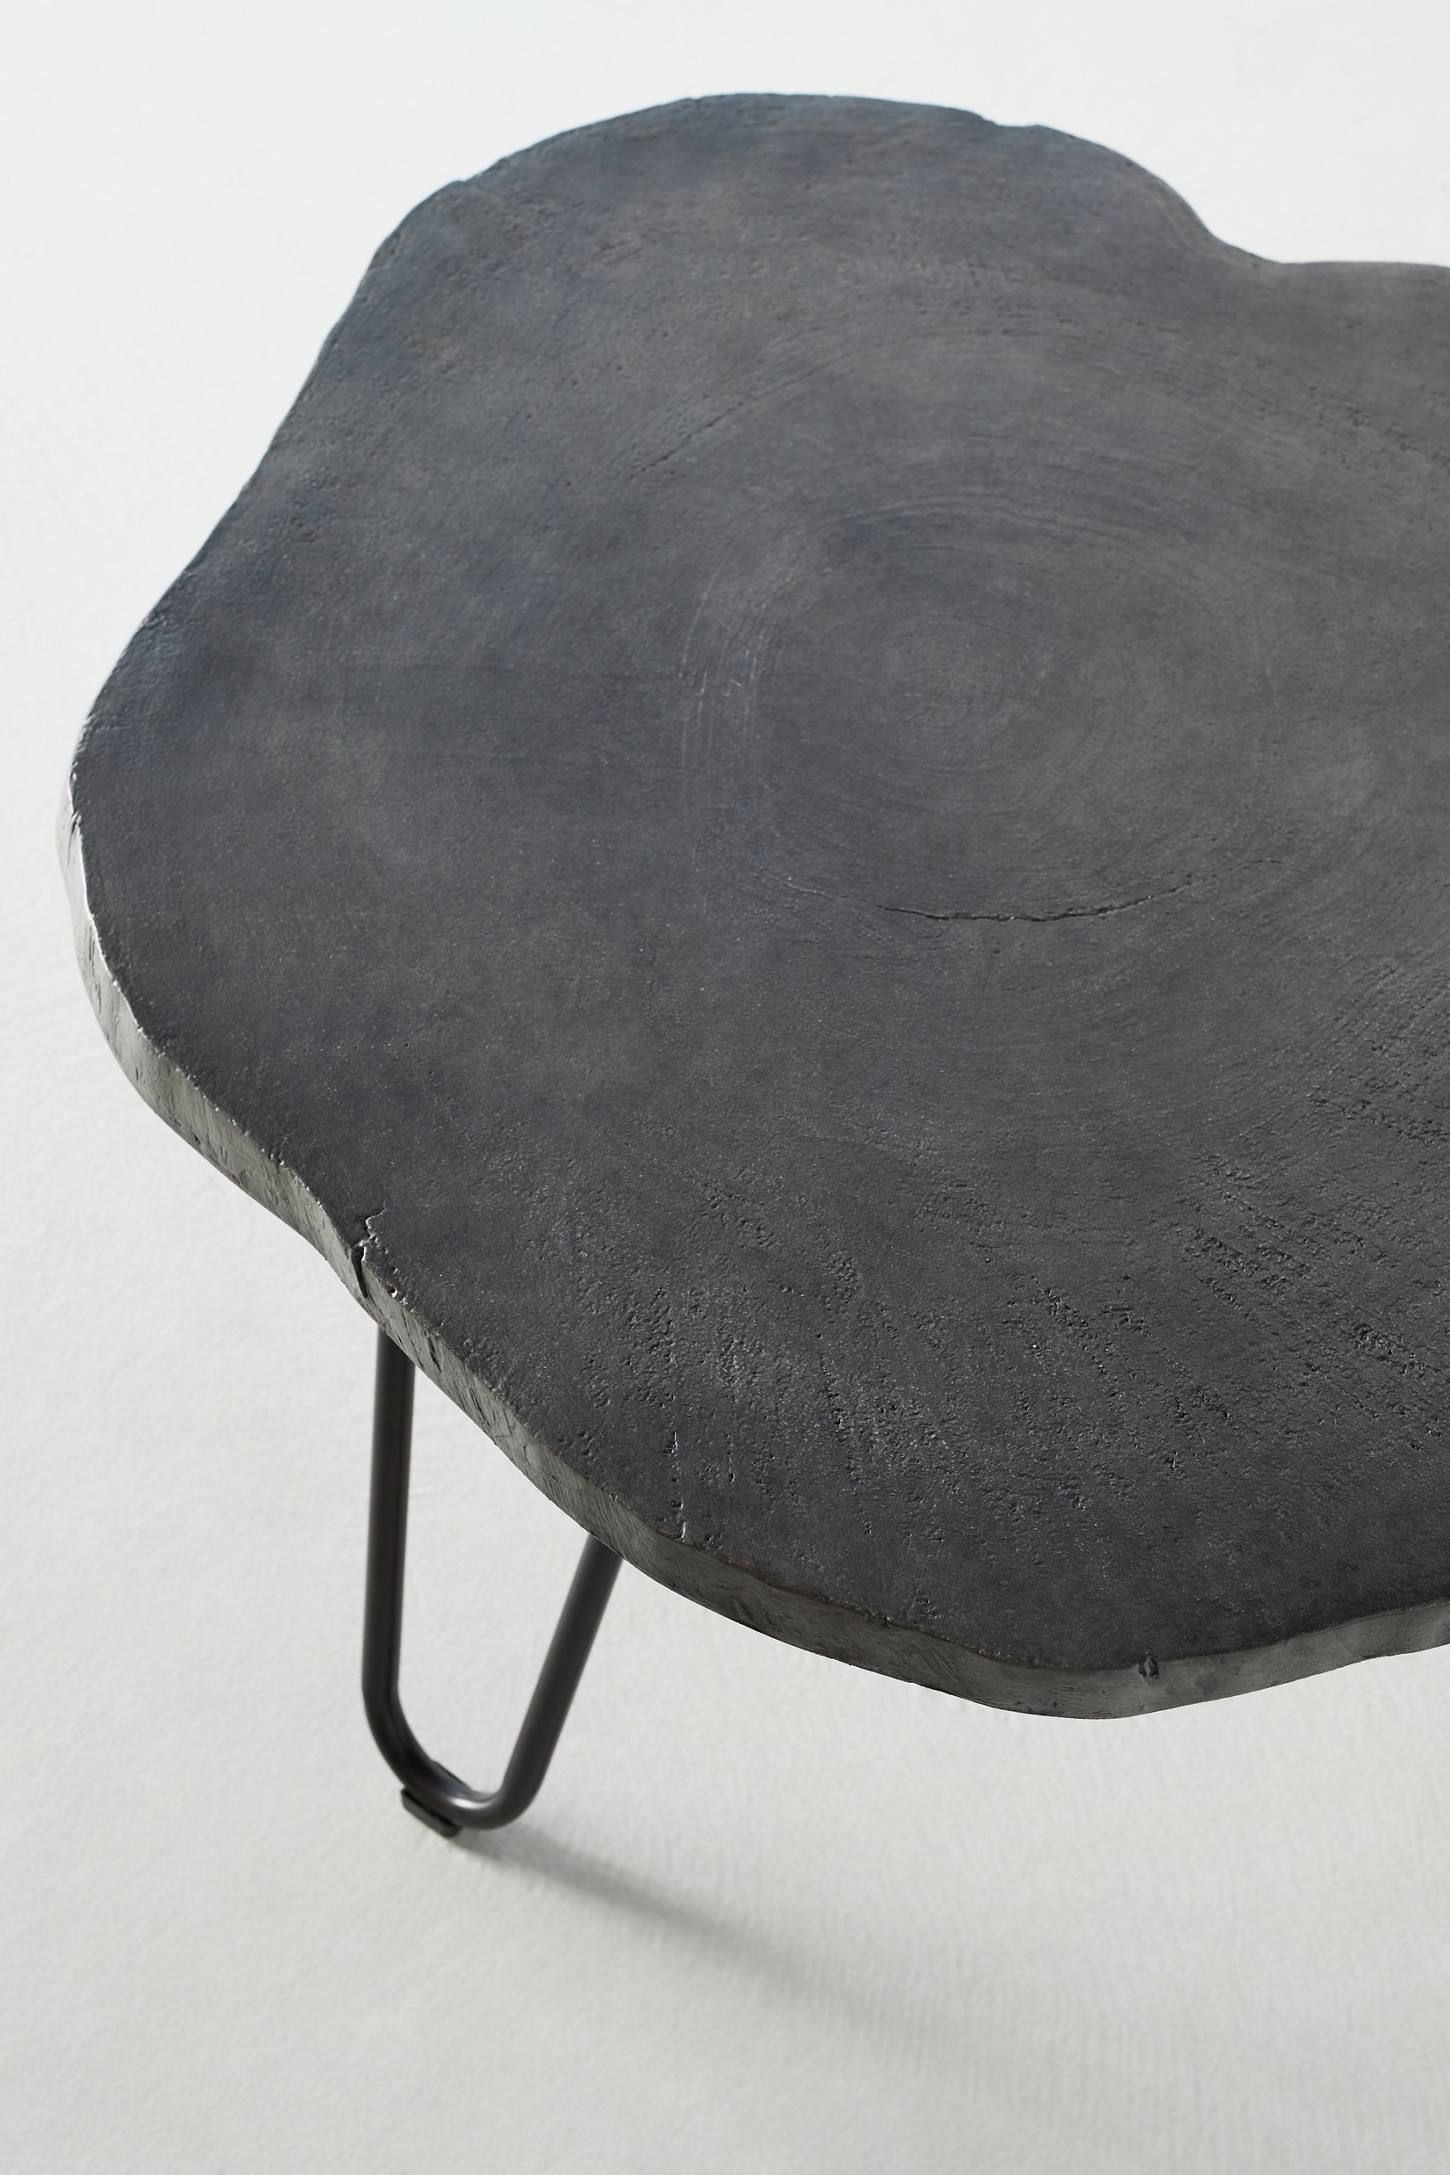 Miraculous Portofino Coffee Table By Anthropologie In White Size All Creativecarmelina Interior Chair Design Creativecarmelinacom